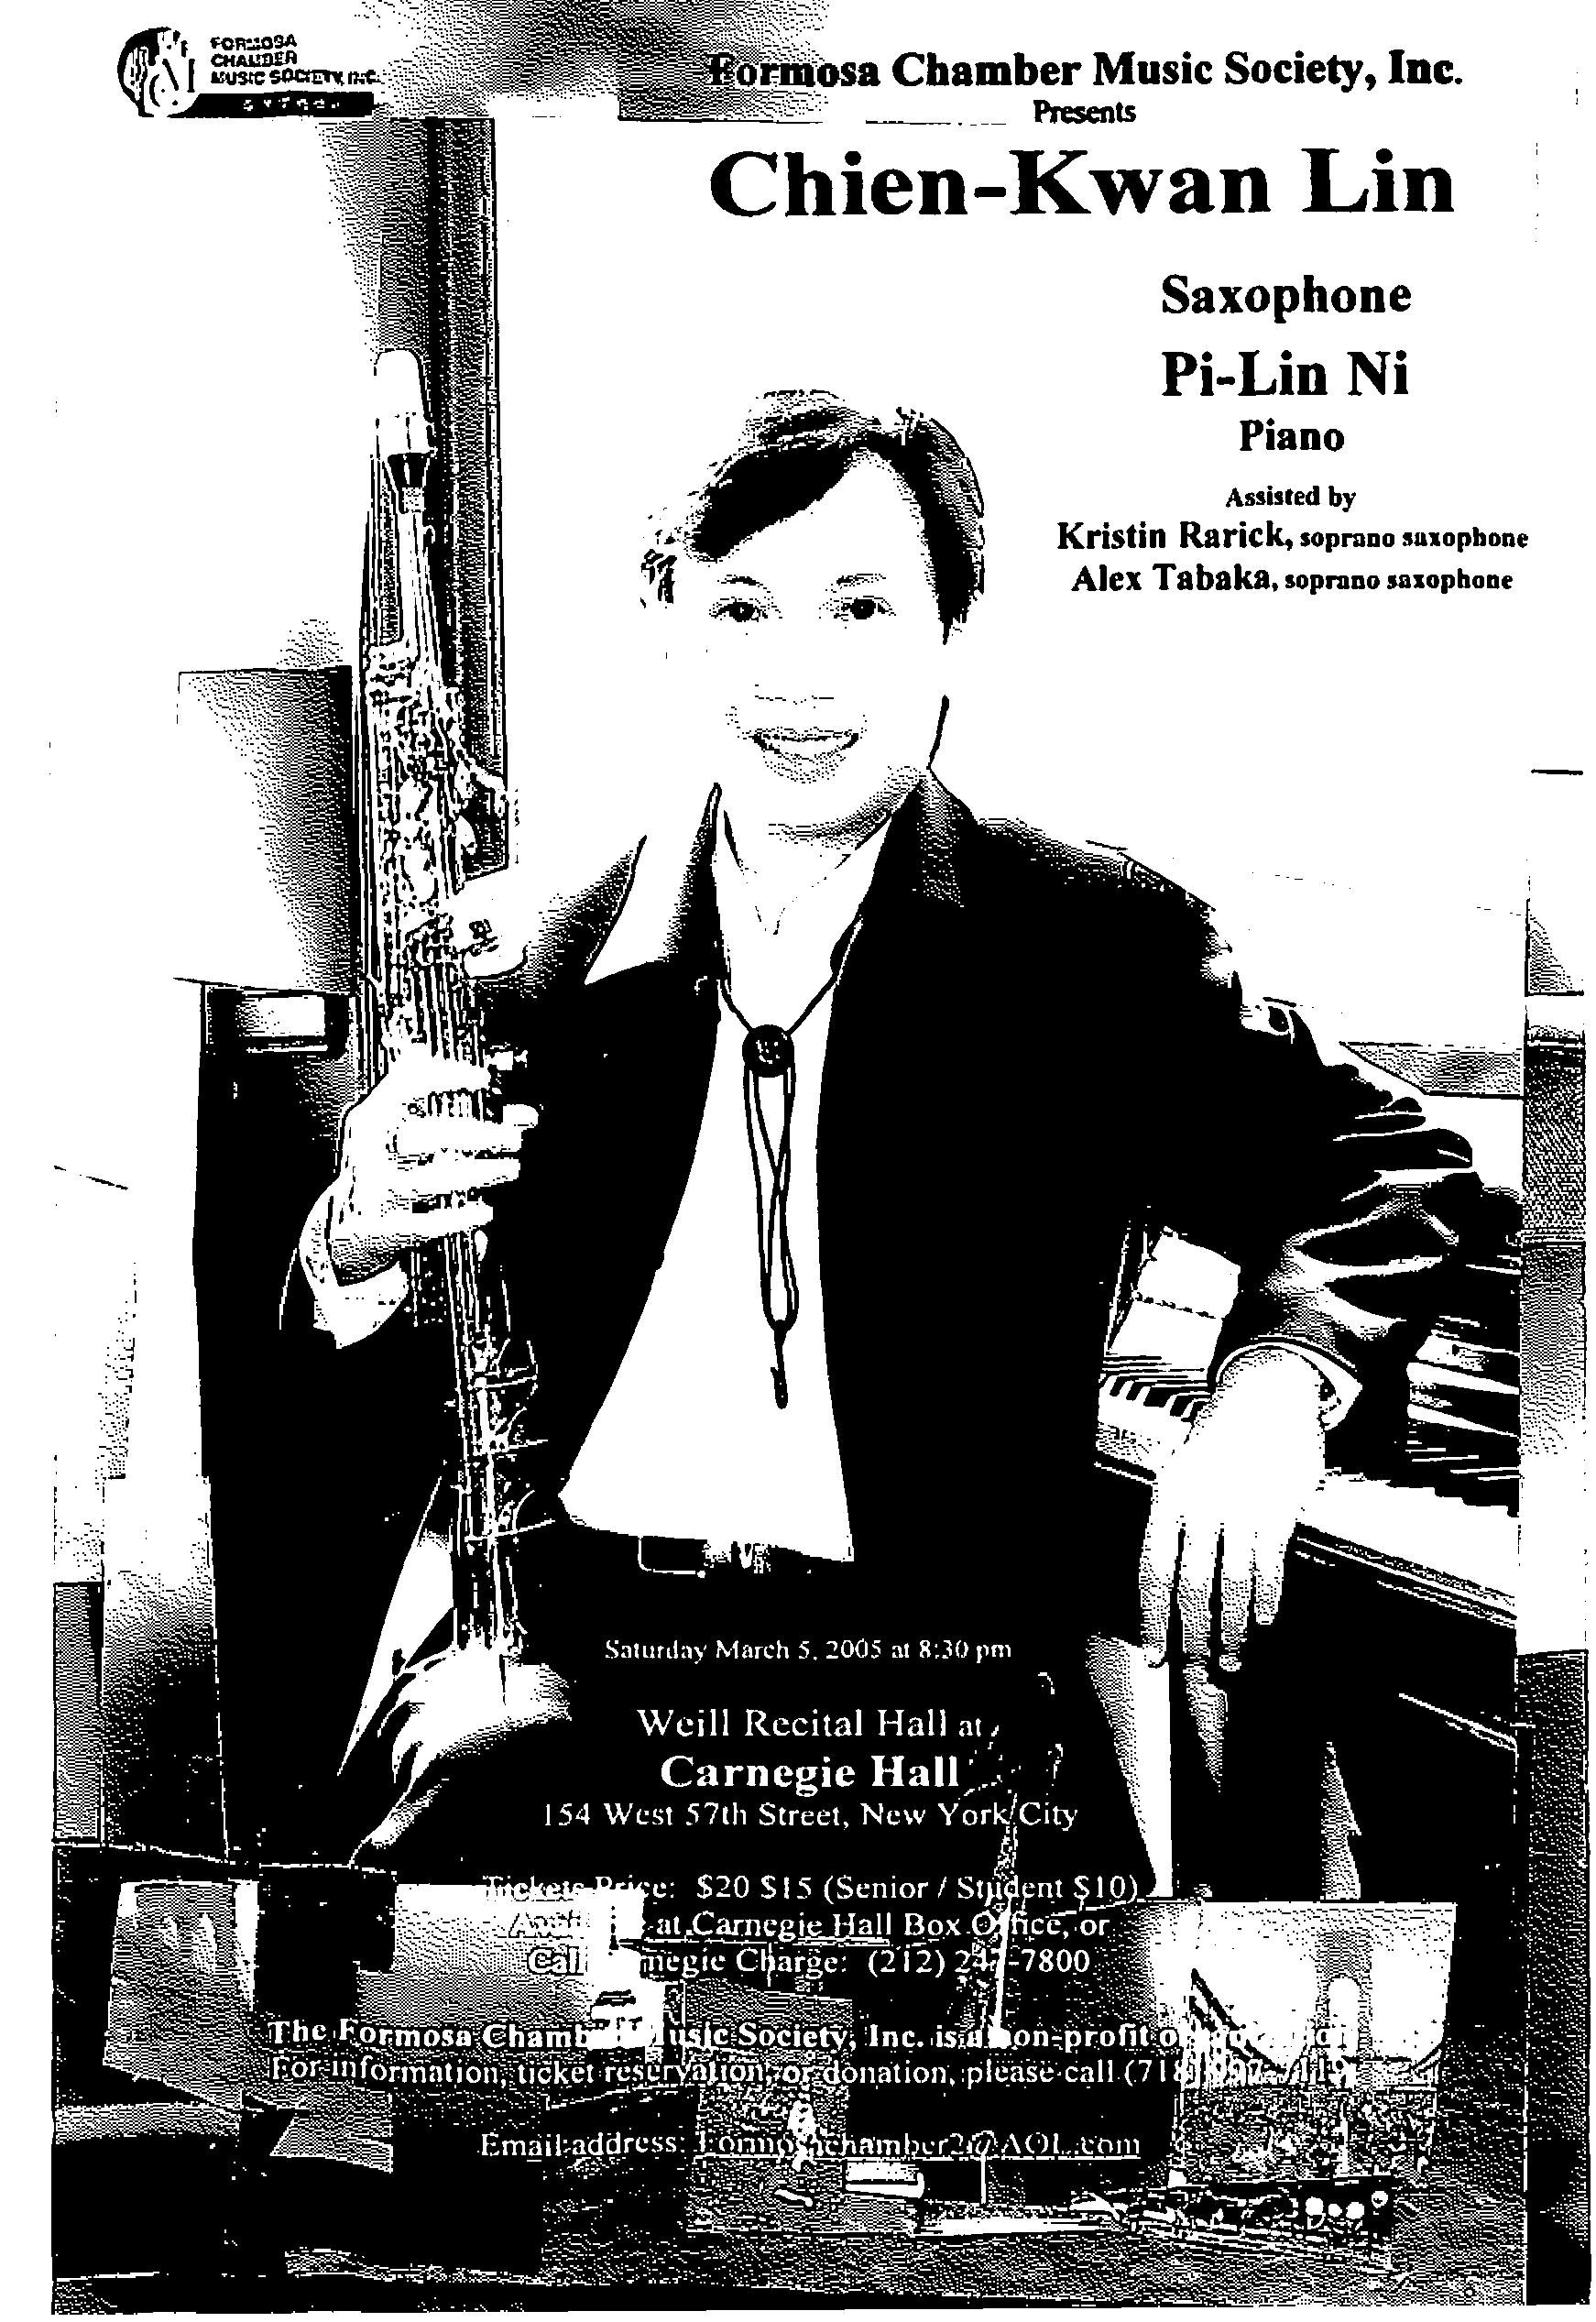 154. Formosa Chamber Music Society/Chien-Kwan Lin Saxophone/3/5/2005